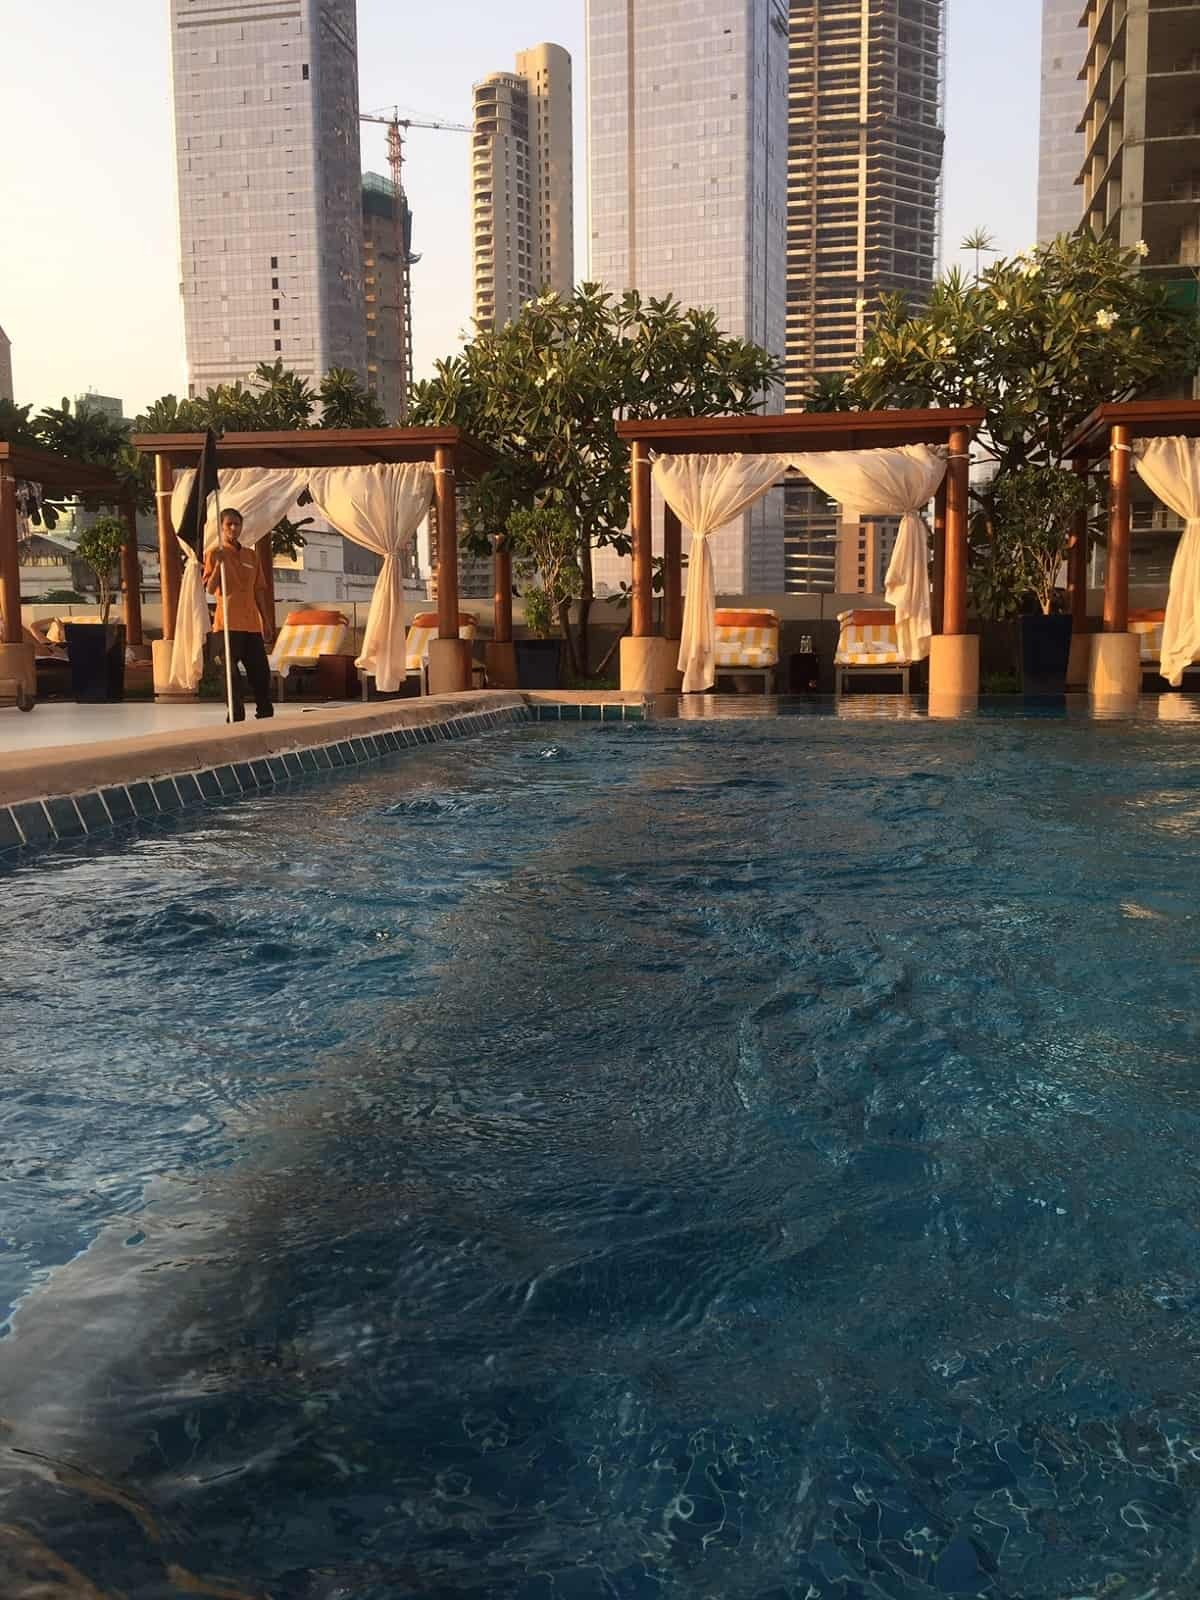 Outdoor pool at Four Seasons Mumbai